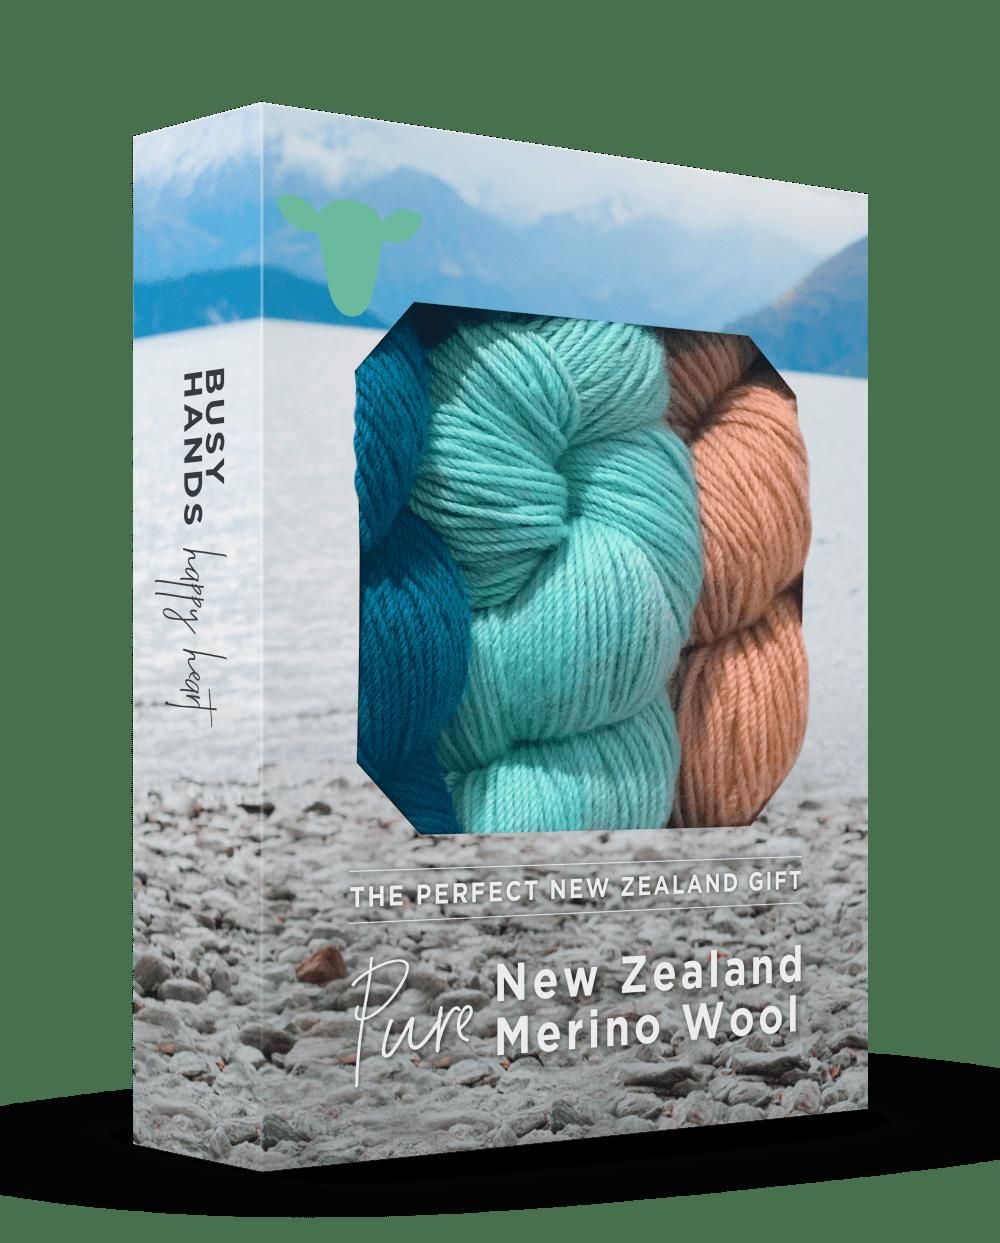 The Woven Co Merino Wool Knitting Yarn Gift Box